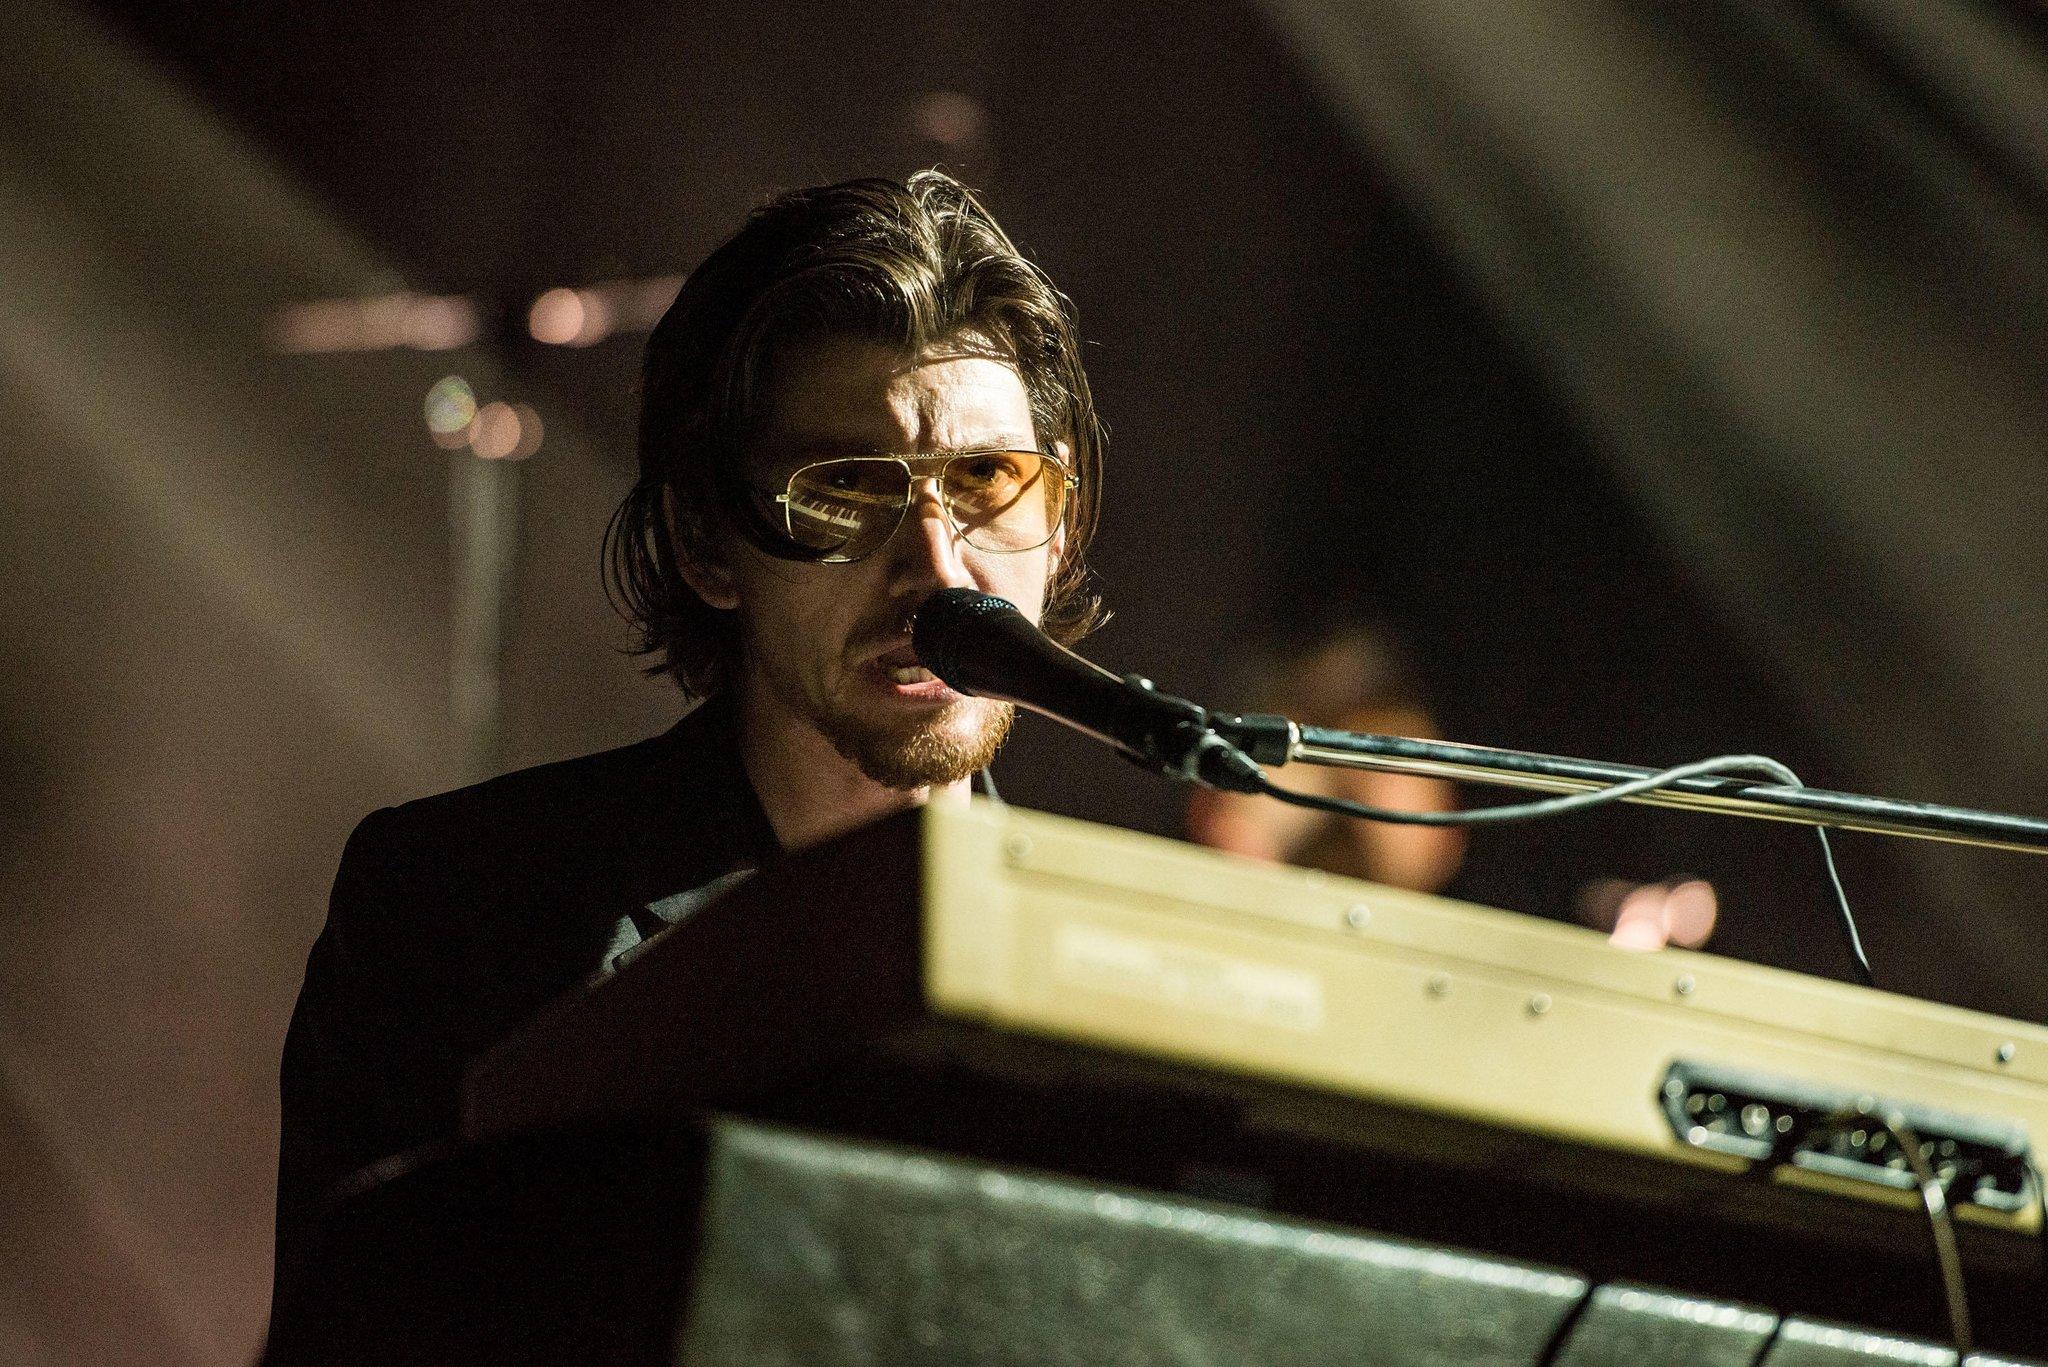 Arctic Monkeys announce surprise London Royal Albert Hall charity show https://t.co/1LzmYxCCmb https://t.co/Tbj6kQBcPJ